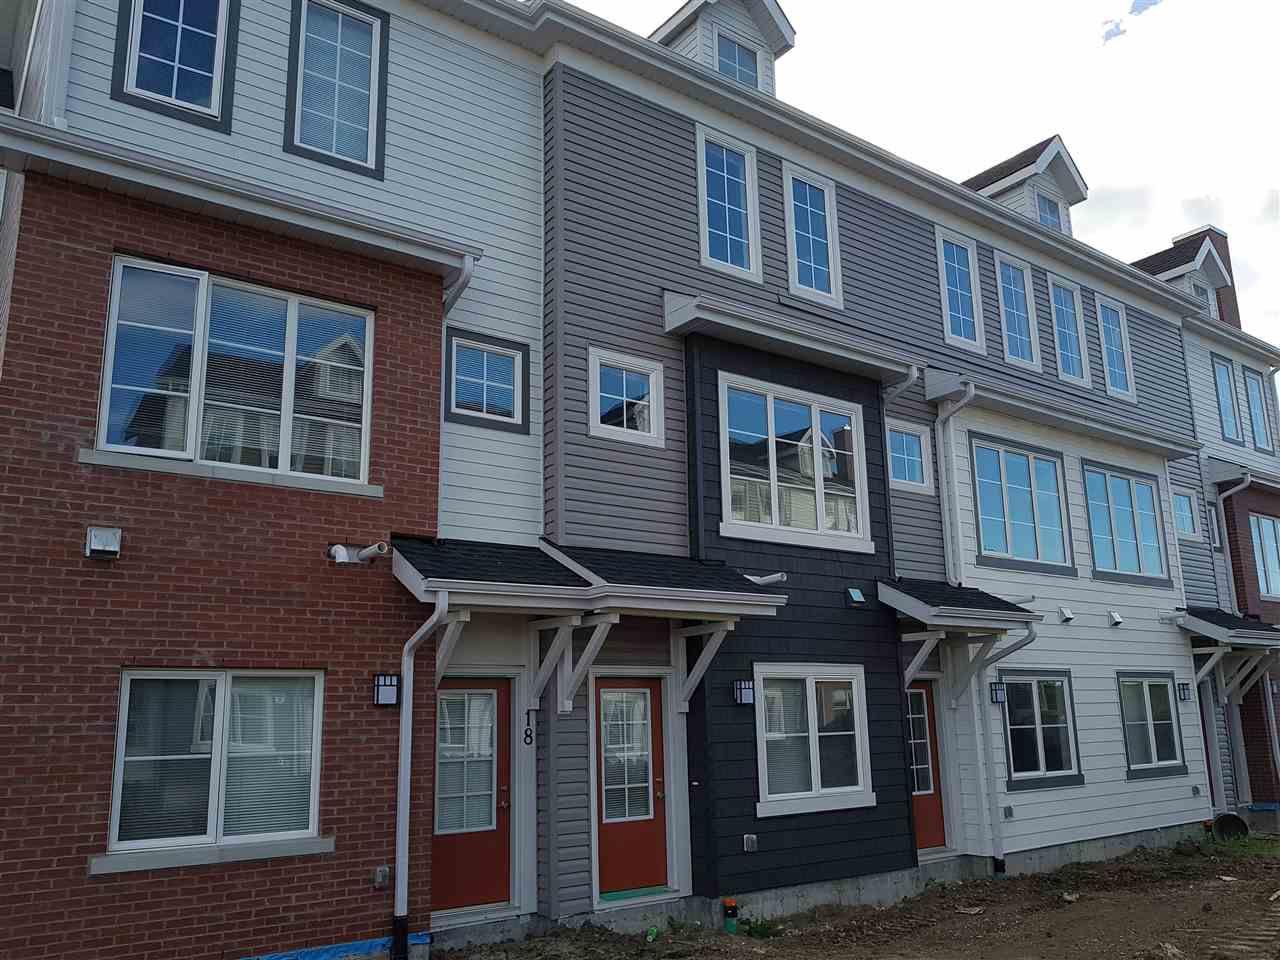 Main Photo: 17 1636 Kerr Road in Edmonton: Zone 27 Townhouse for sale : MLS®# E4142512